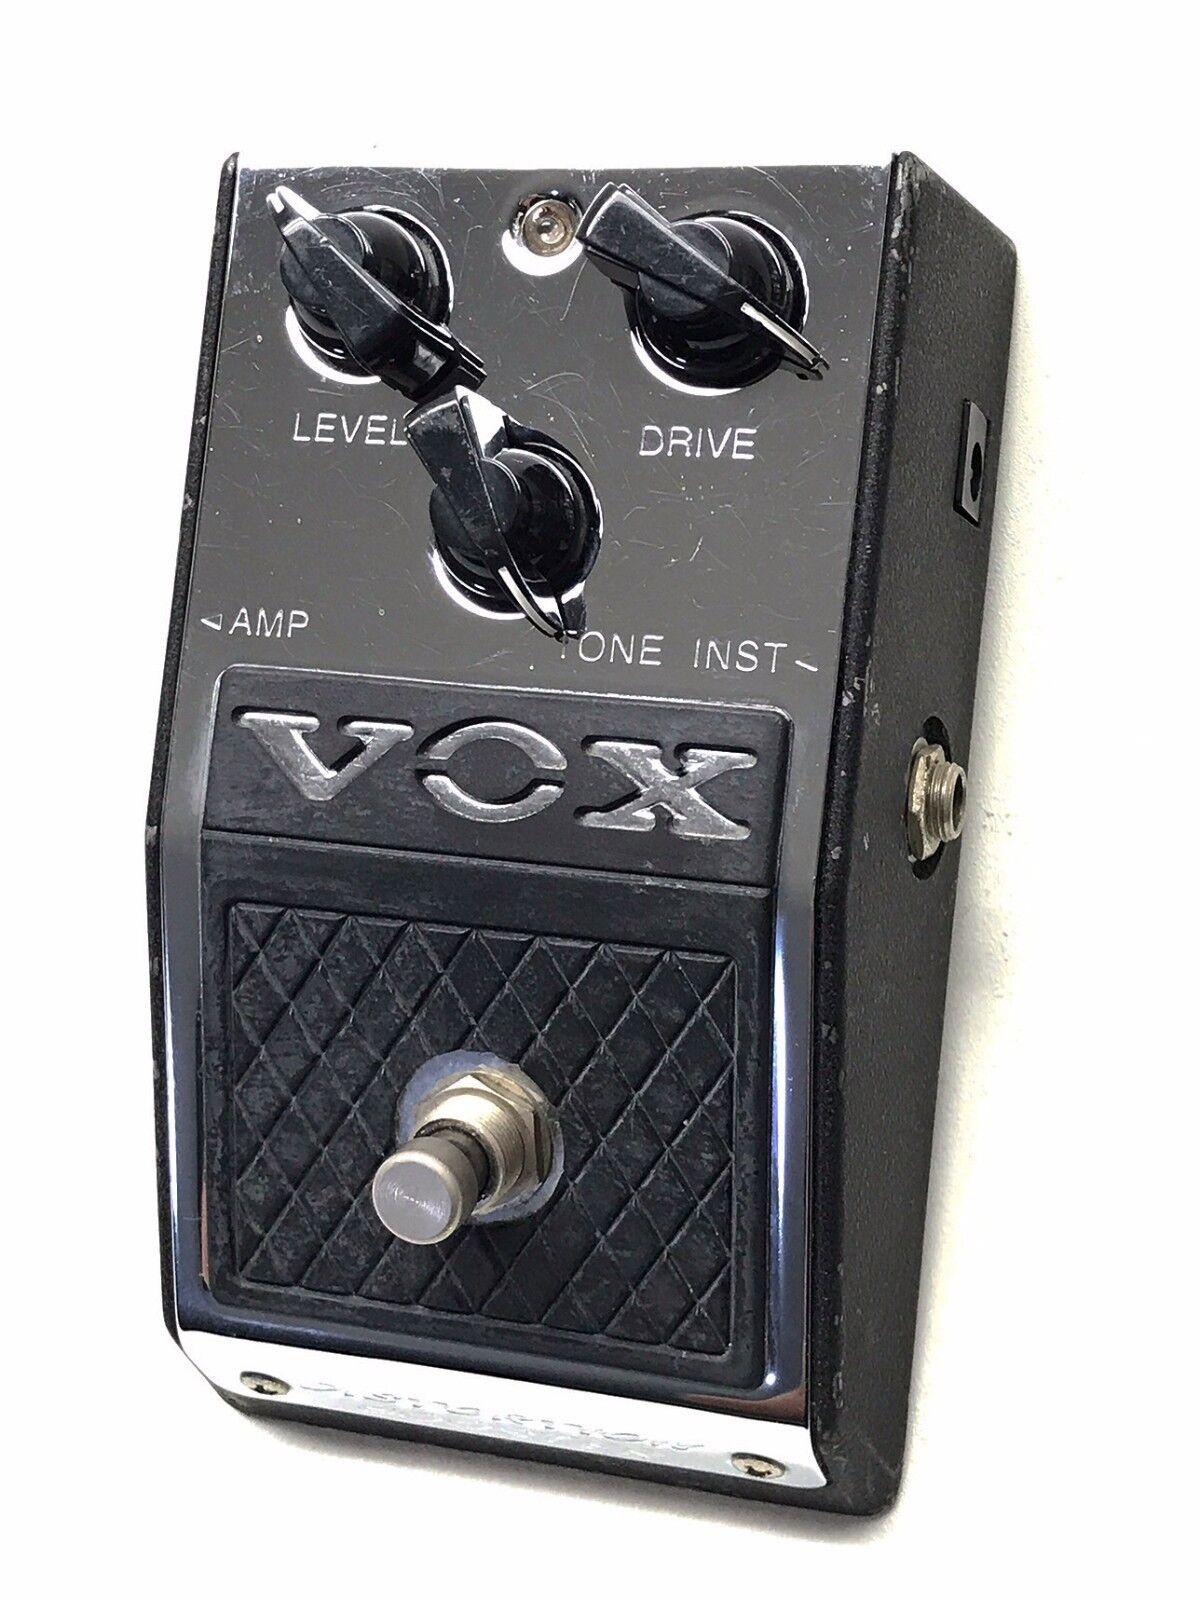 Vox V830, Distortion Booster, 90'S, RARE Hard To Find, Guitar Effect Pedal